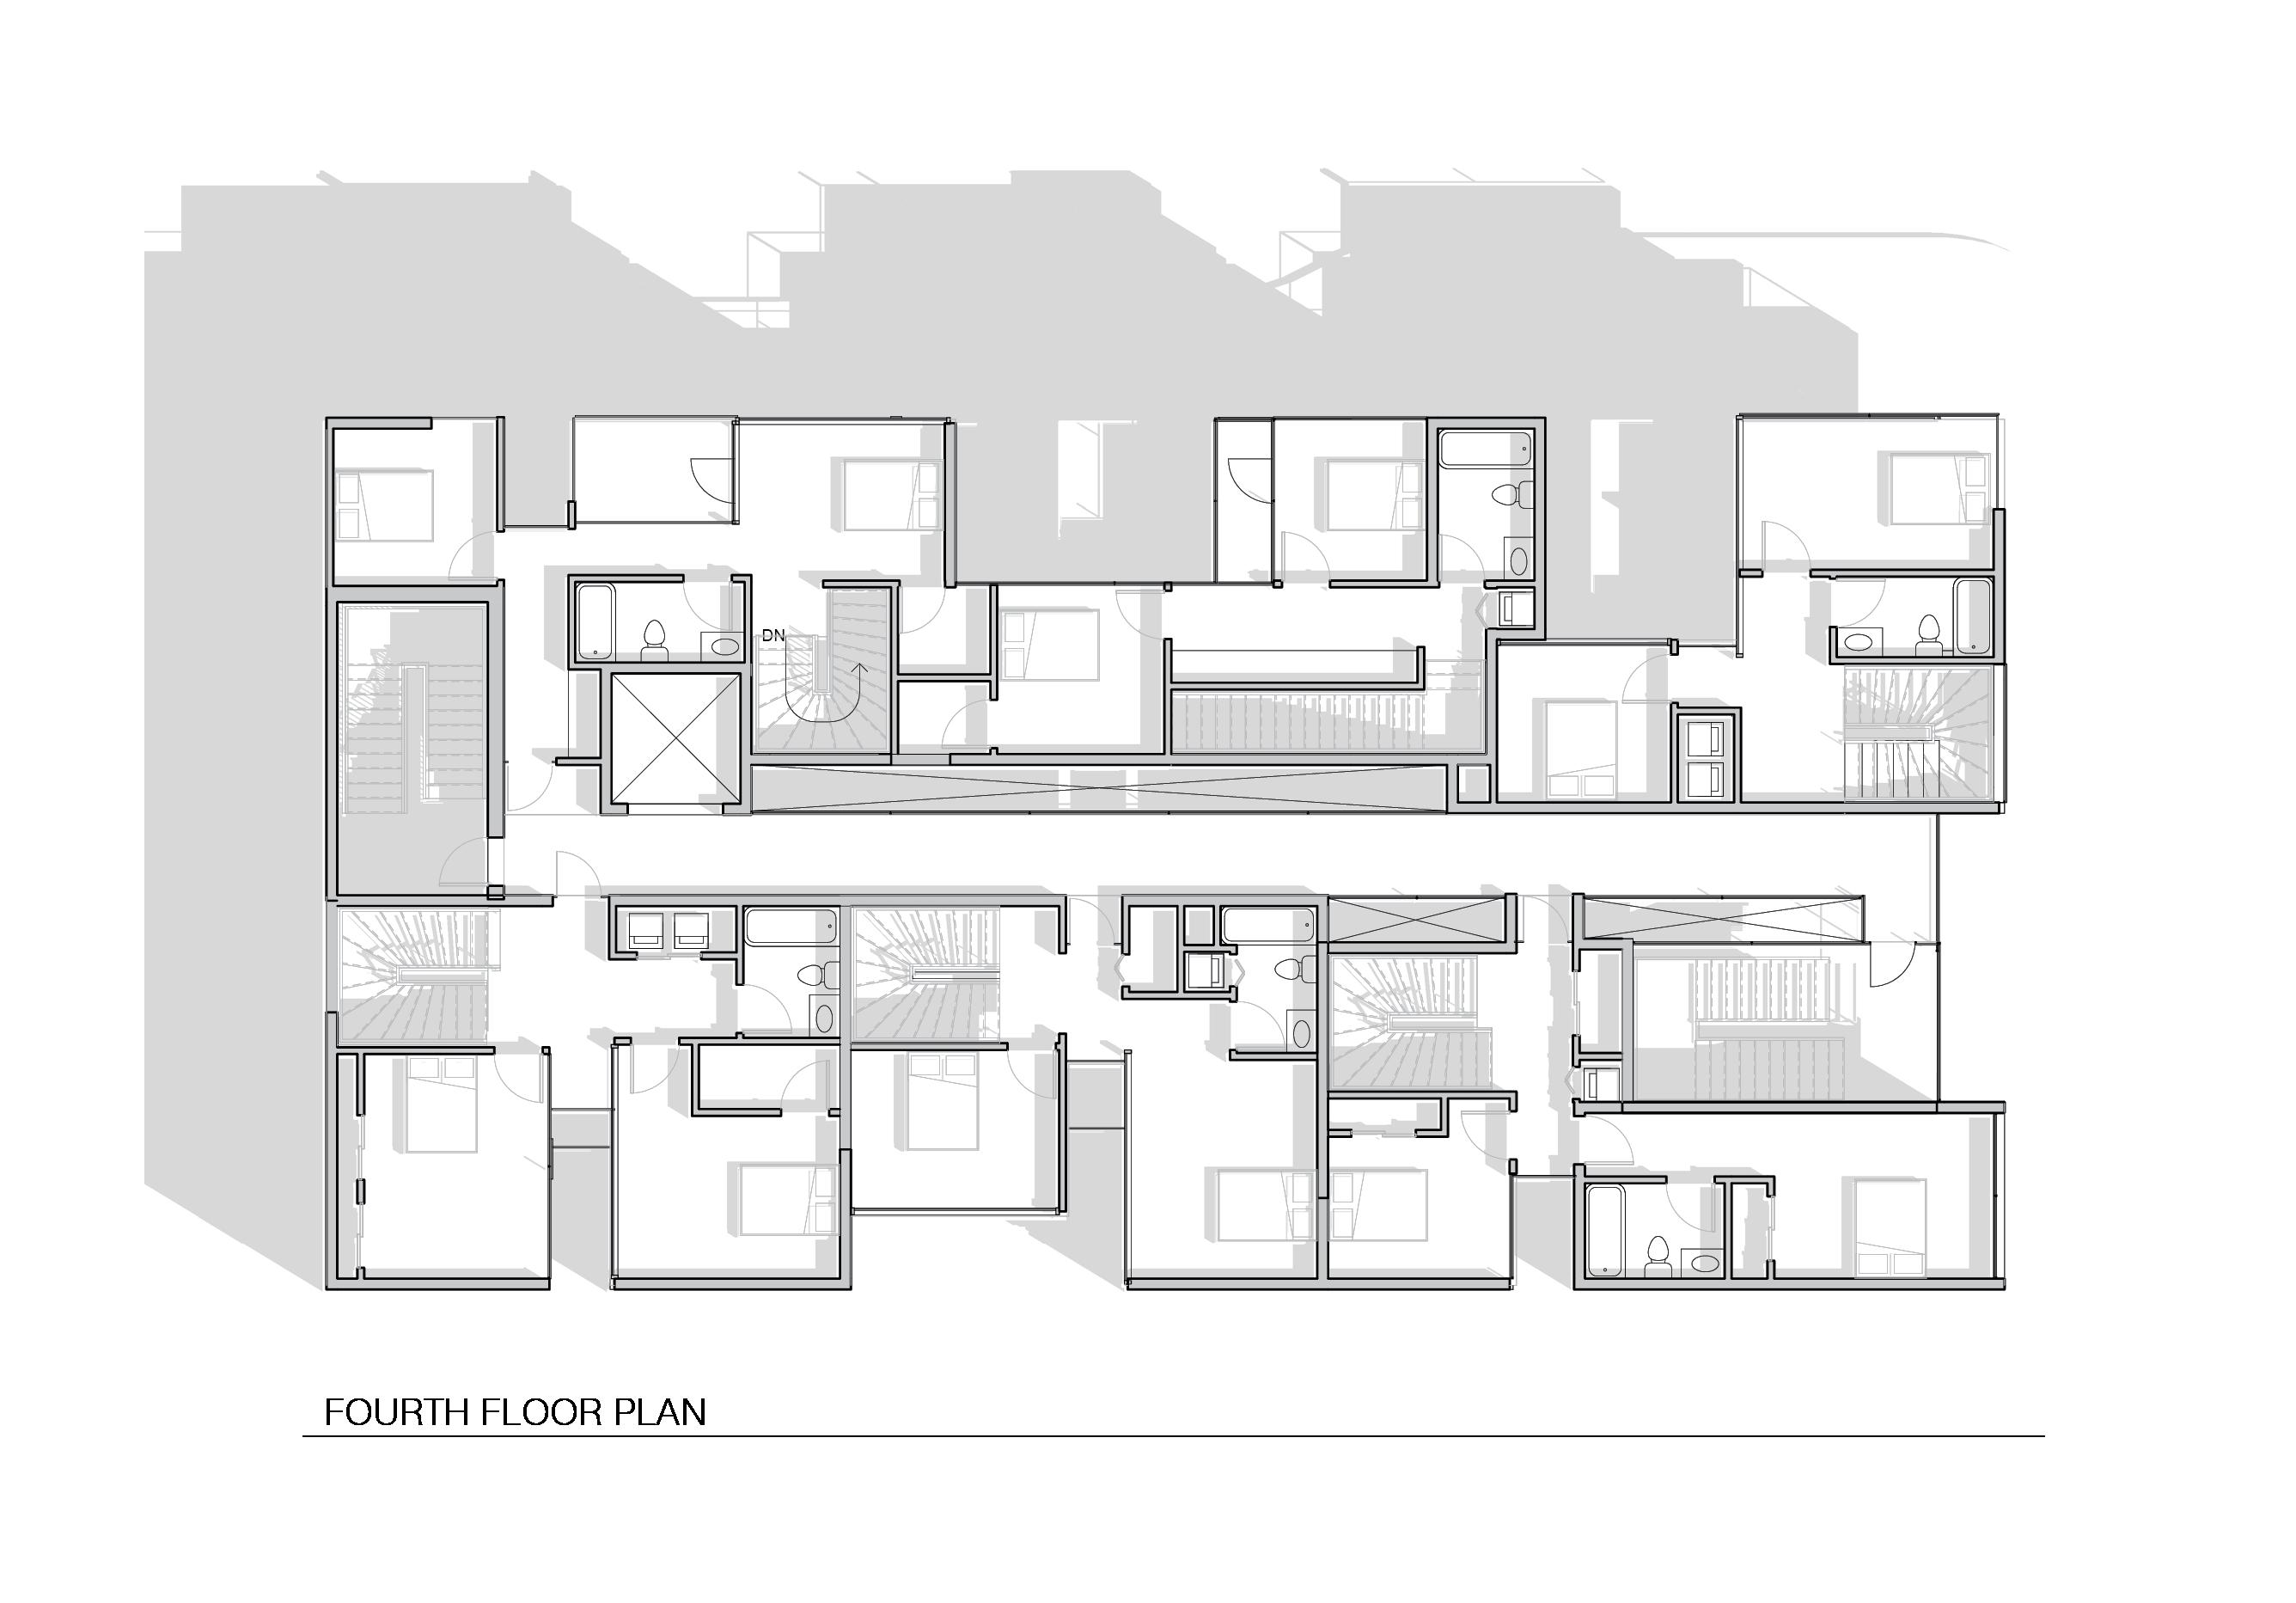 Final Review board-05 4th floor plan